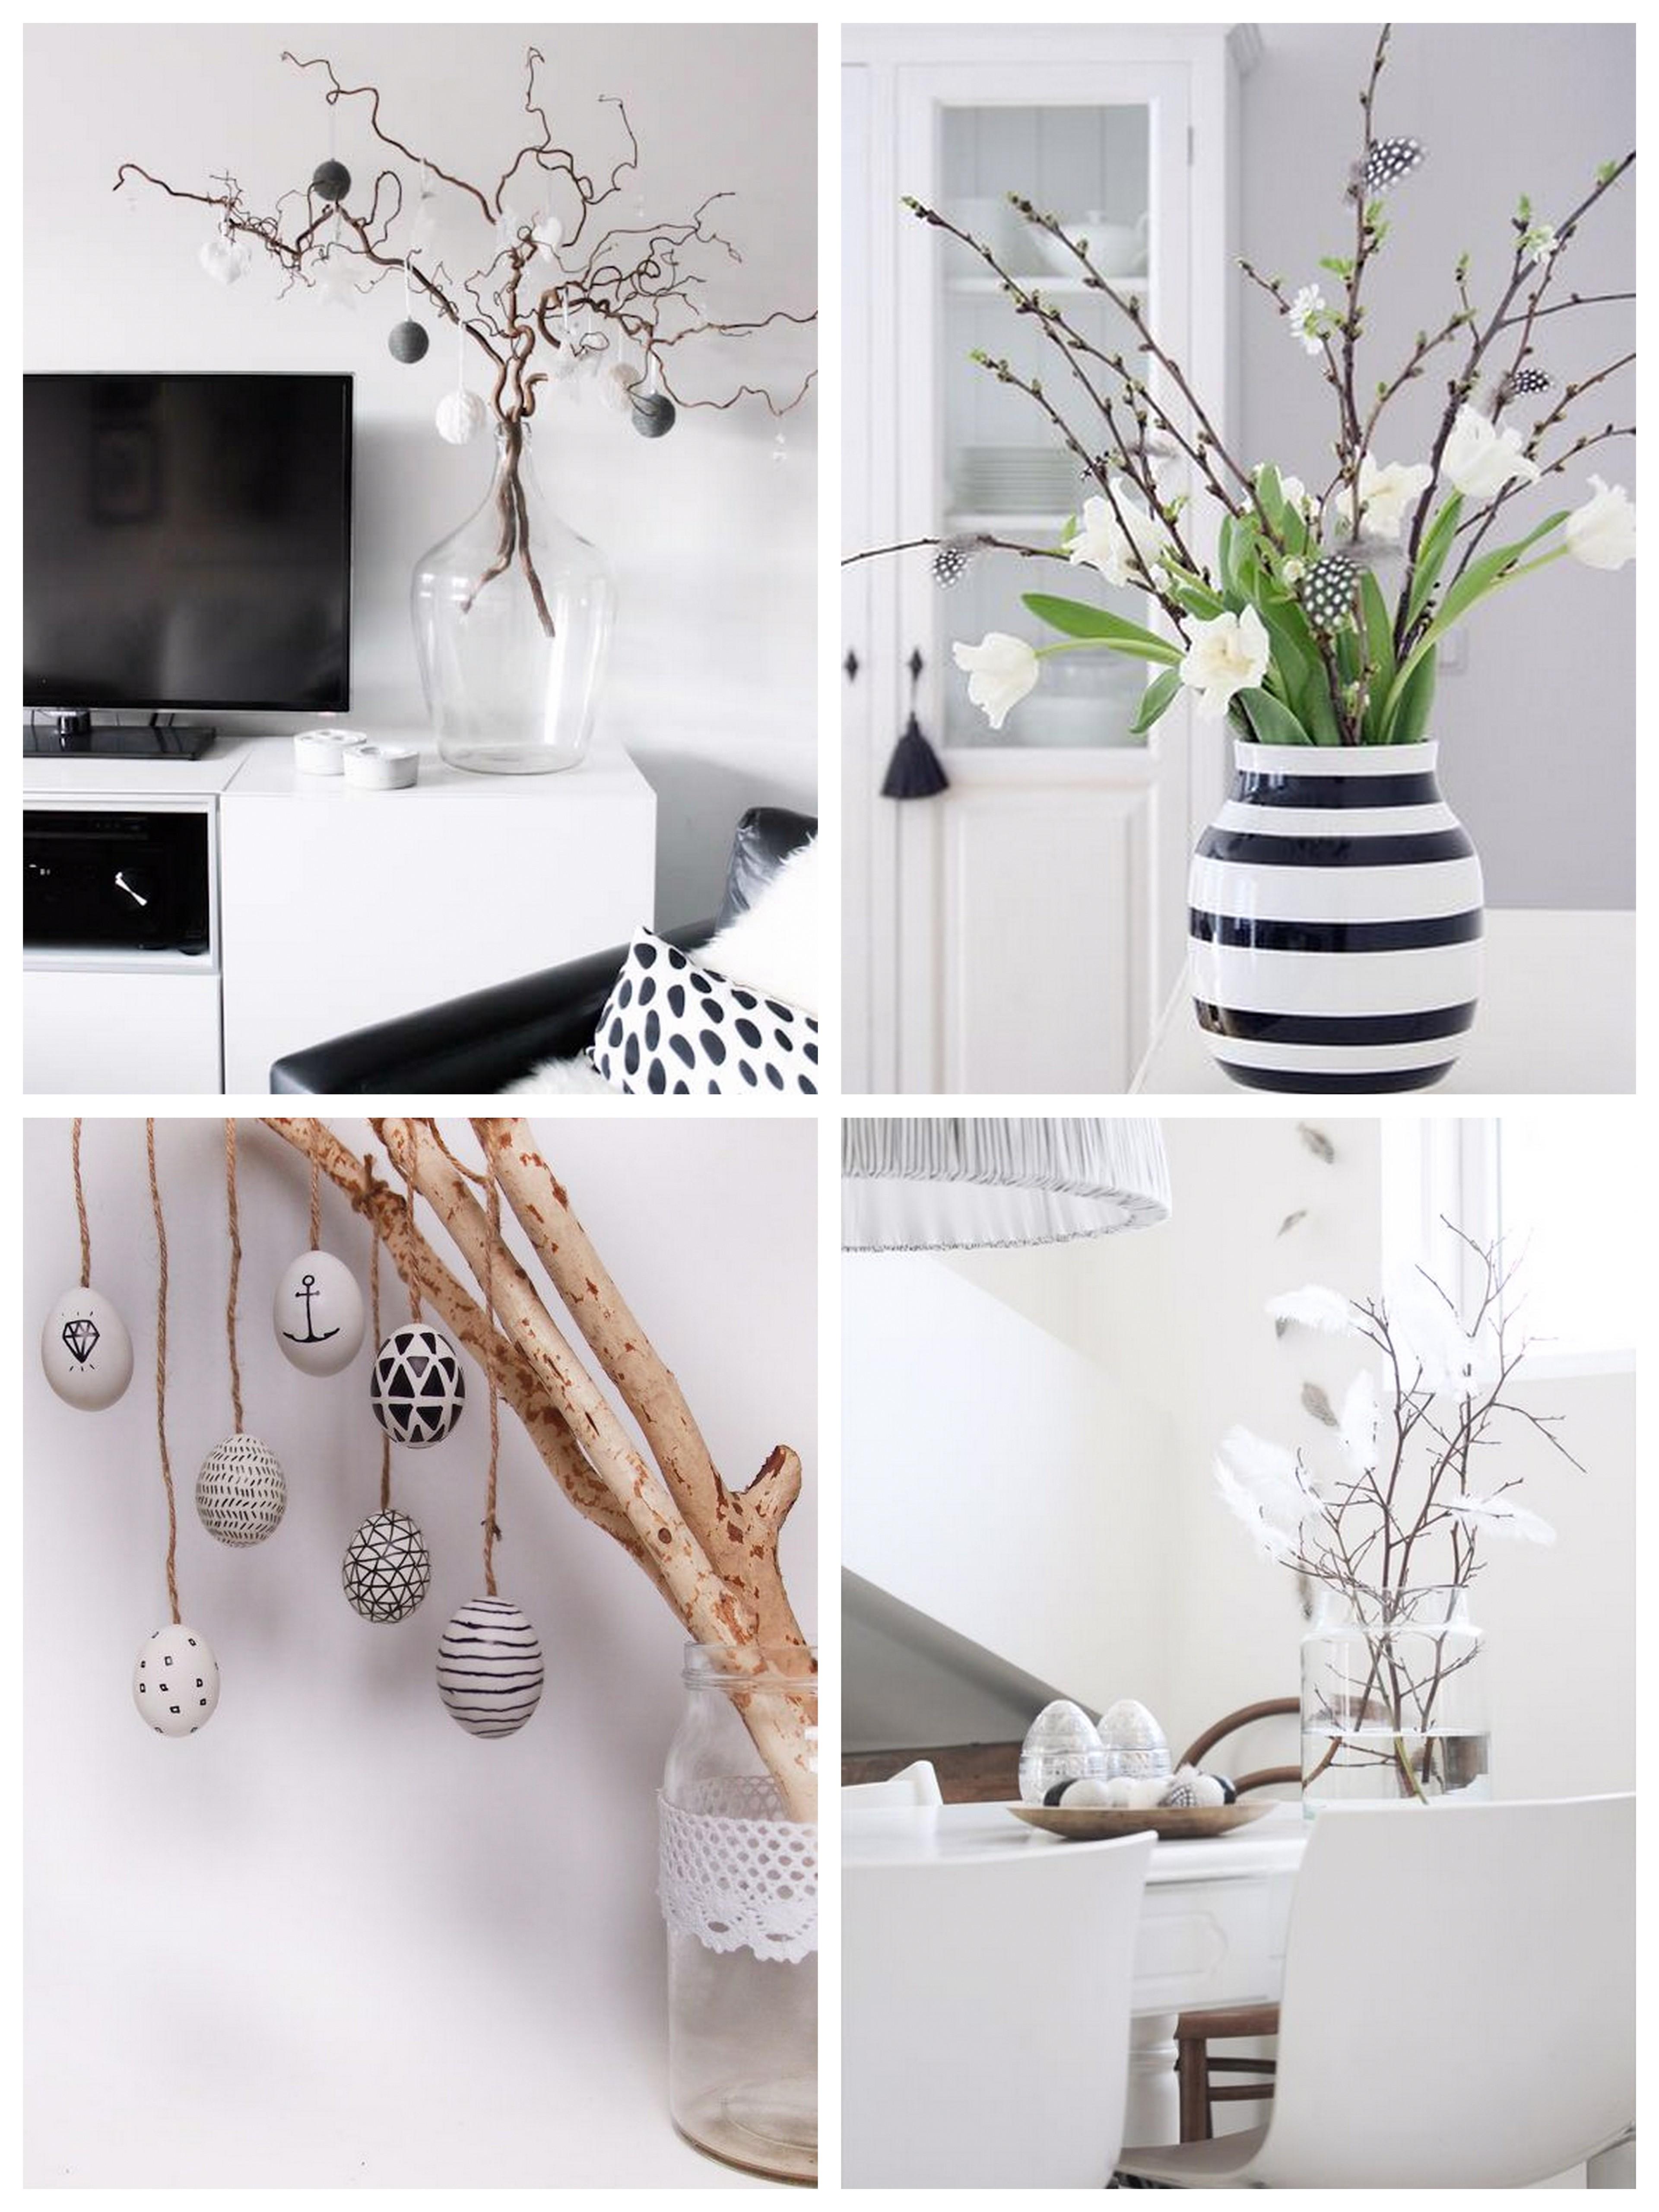 http://www.alllovelythings.nl/wp-content/uploads/2015/04/Paastakken-interieur-trends.jpg